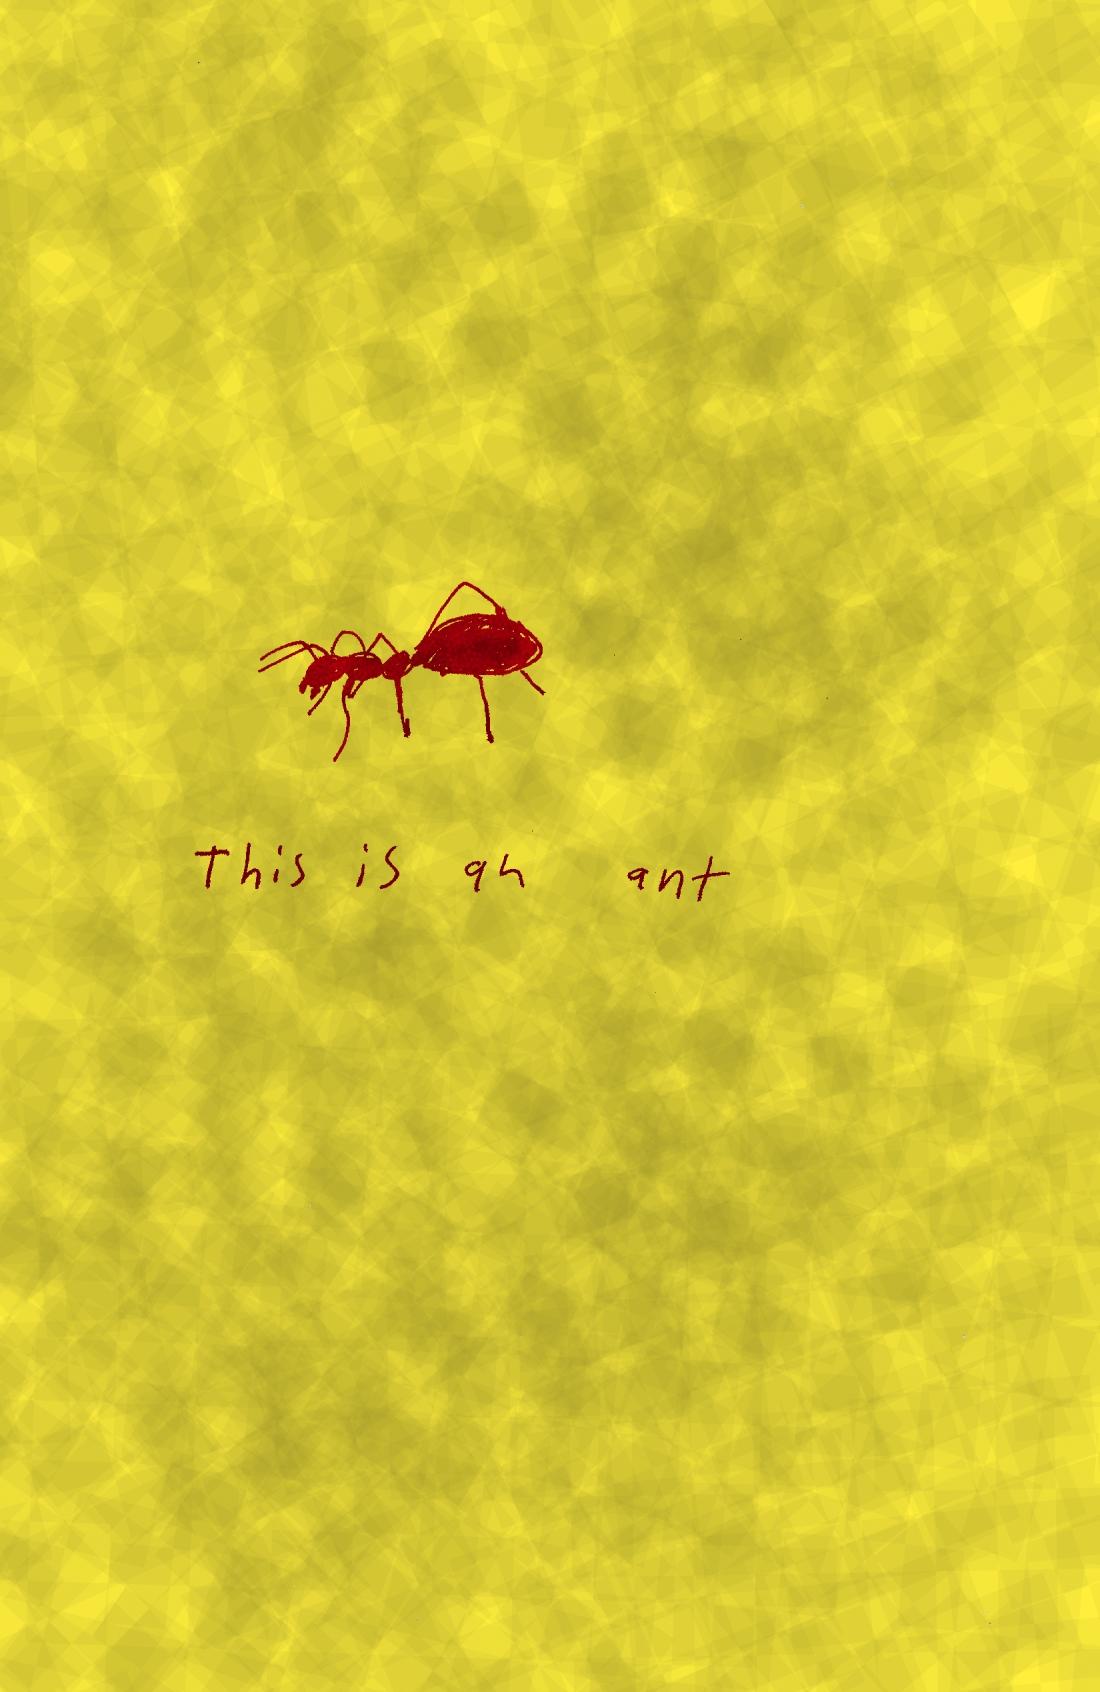 bugs pg 4 c